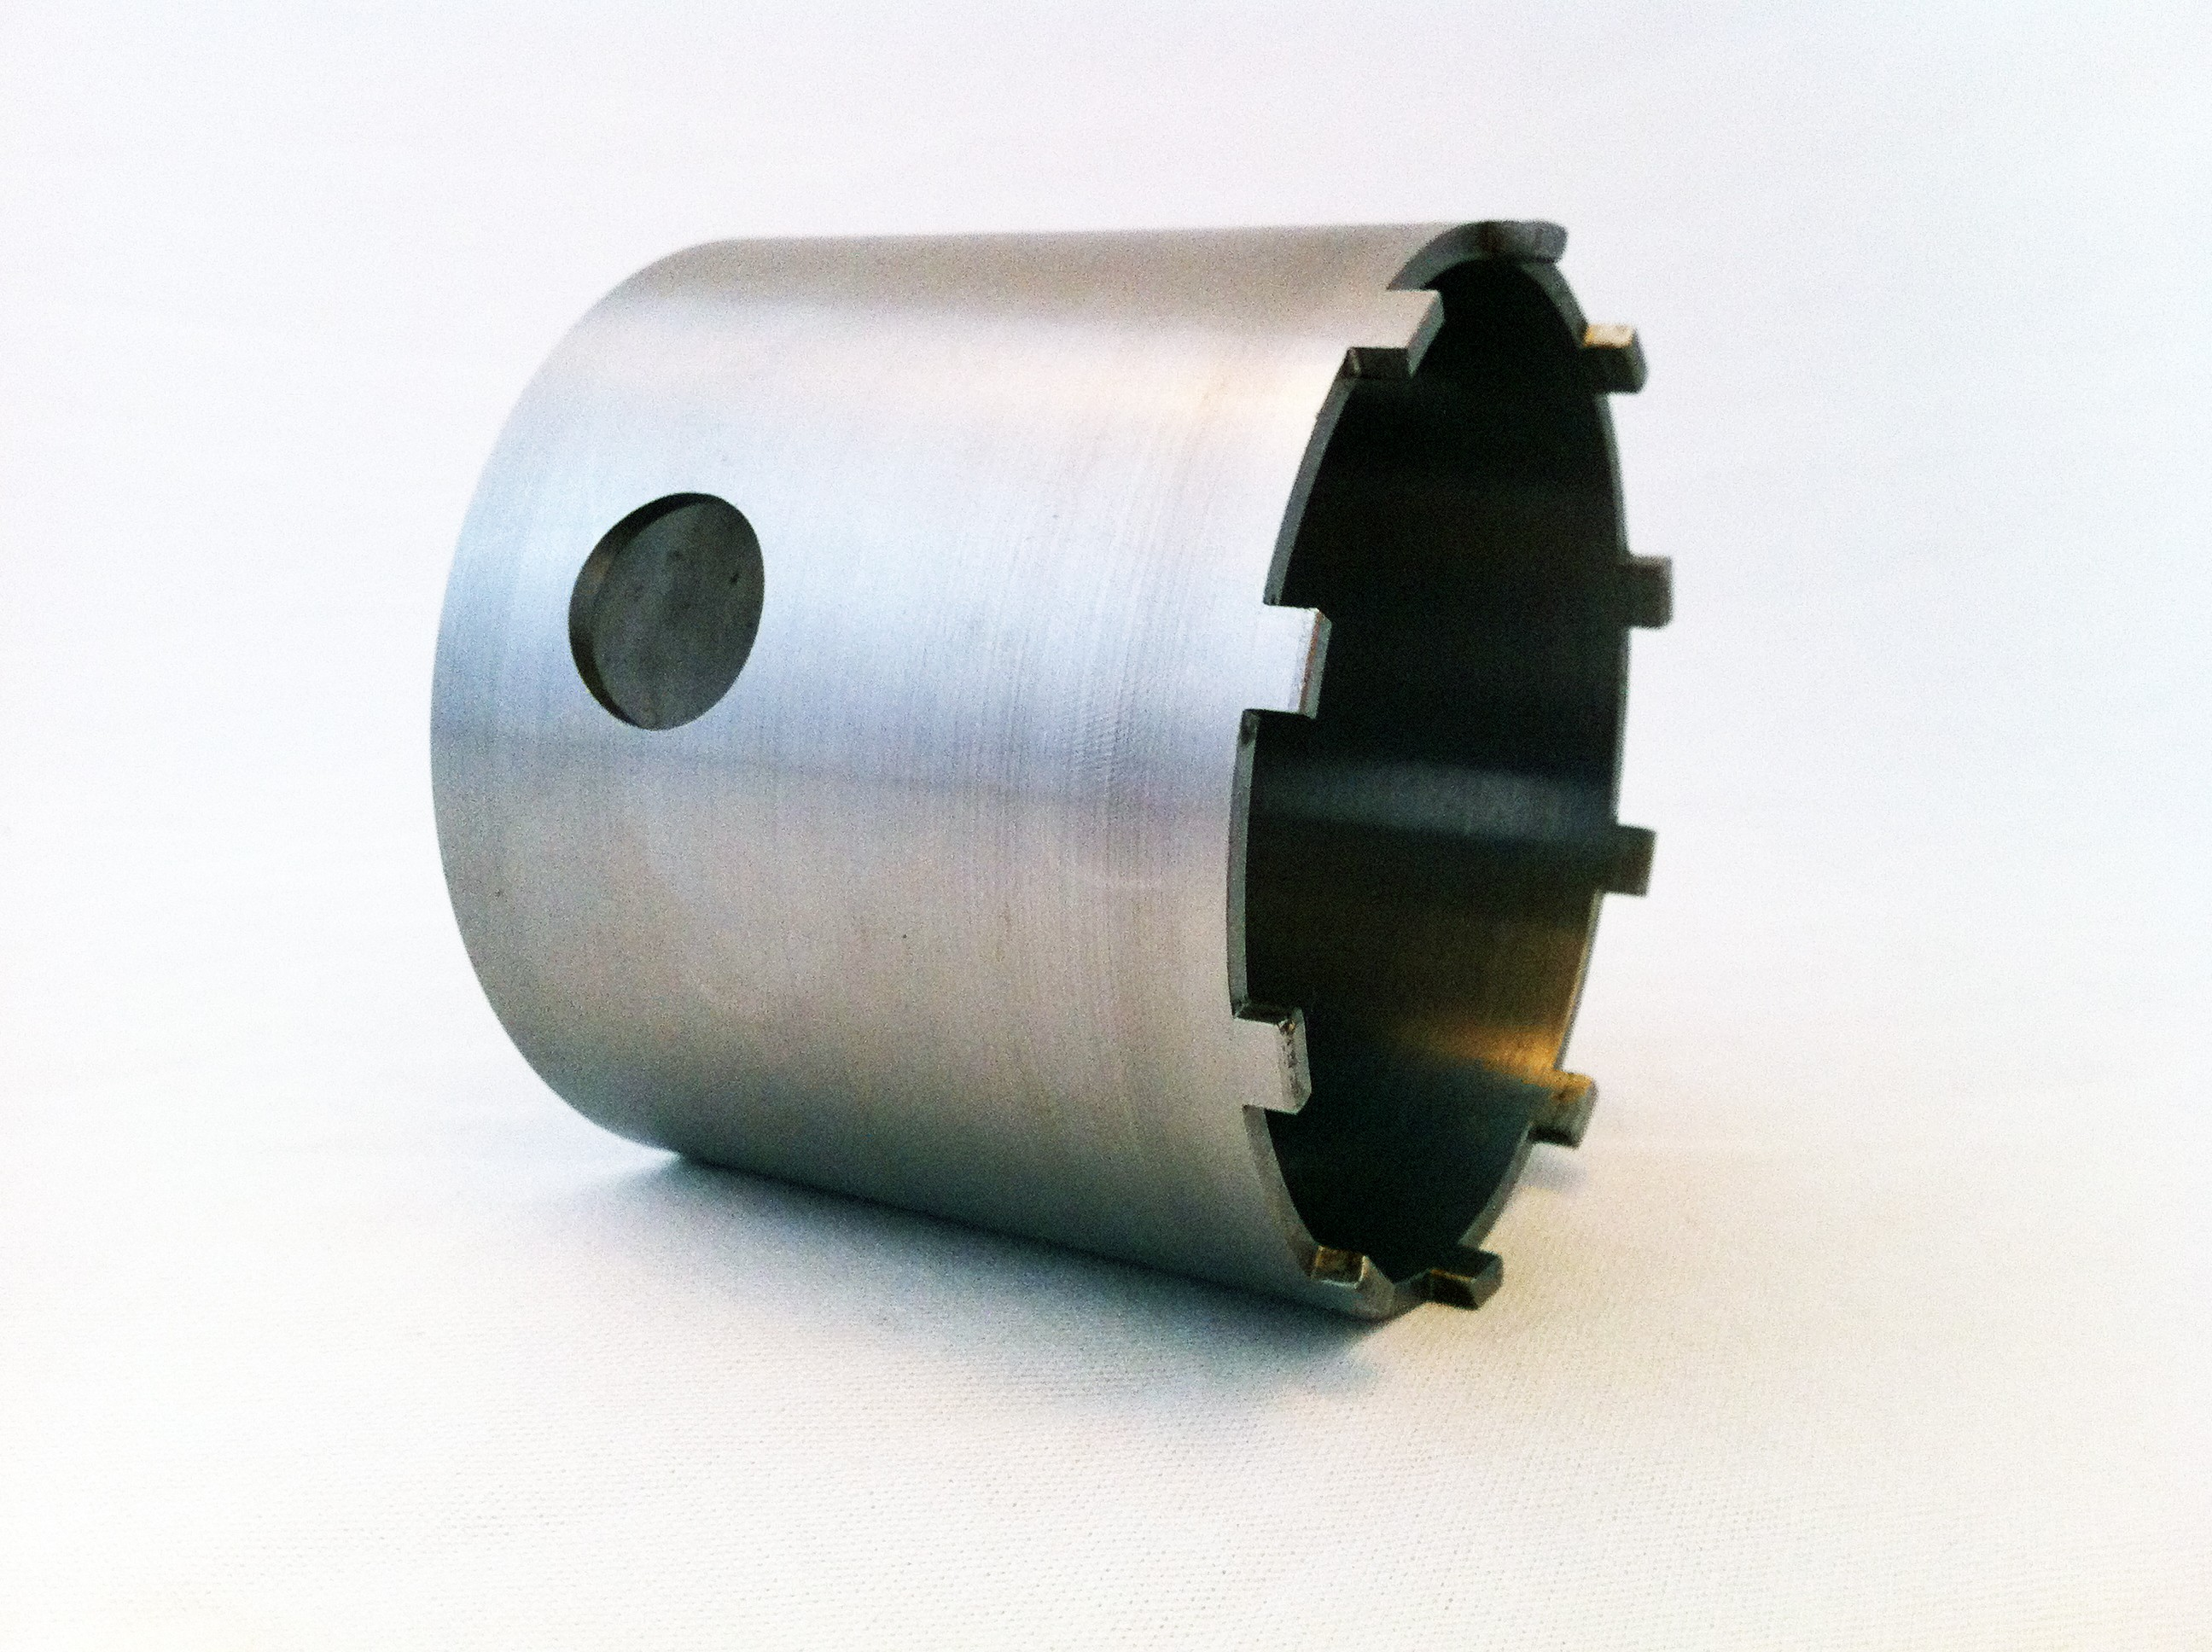 Socket Drive Castellation Spanner